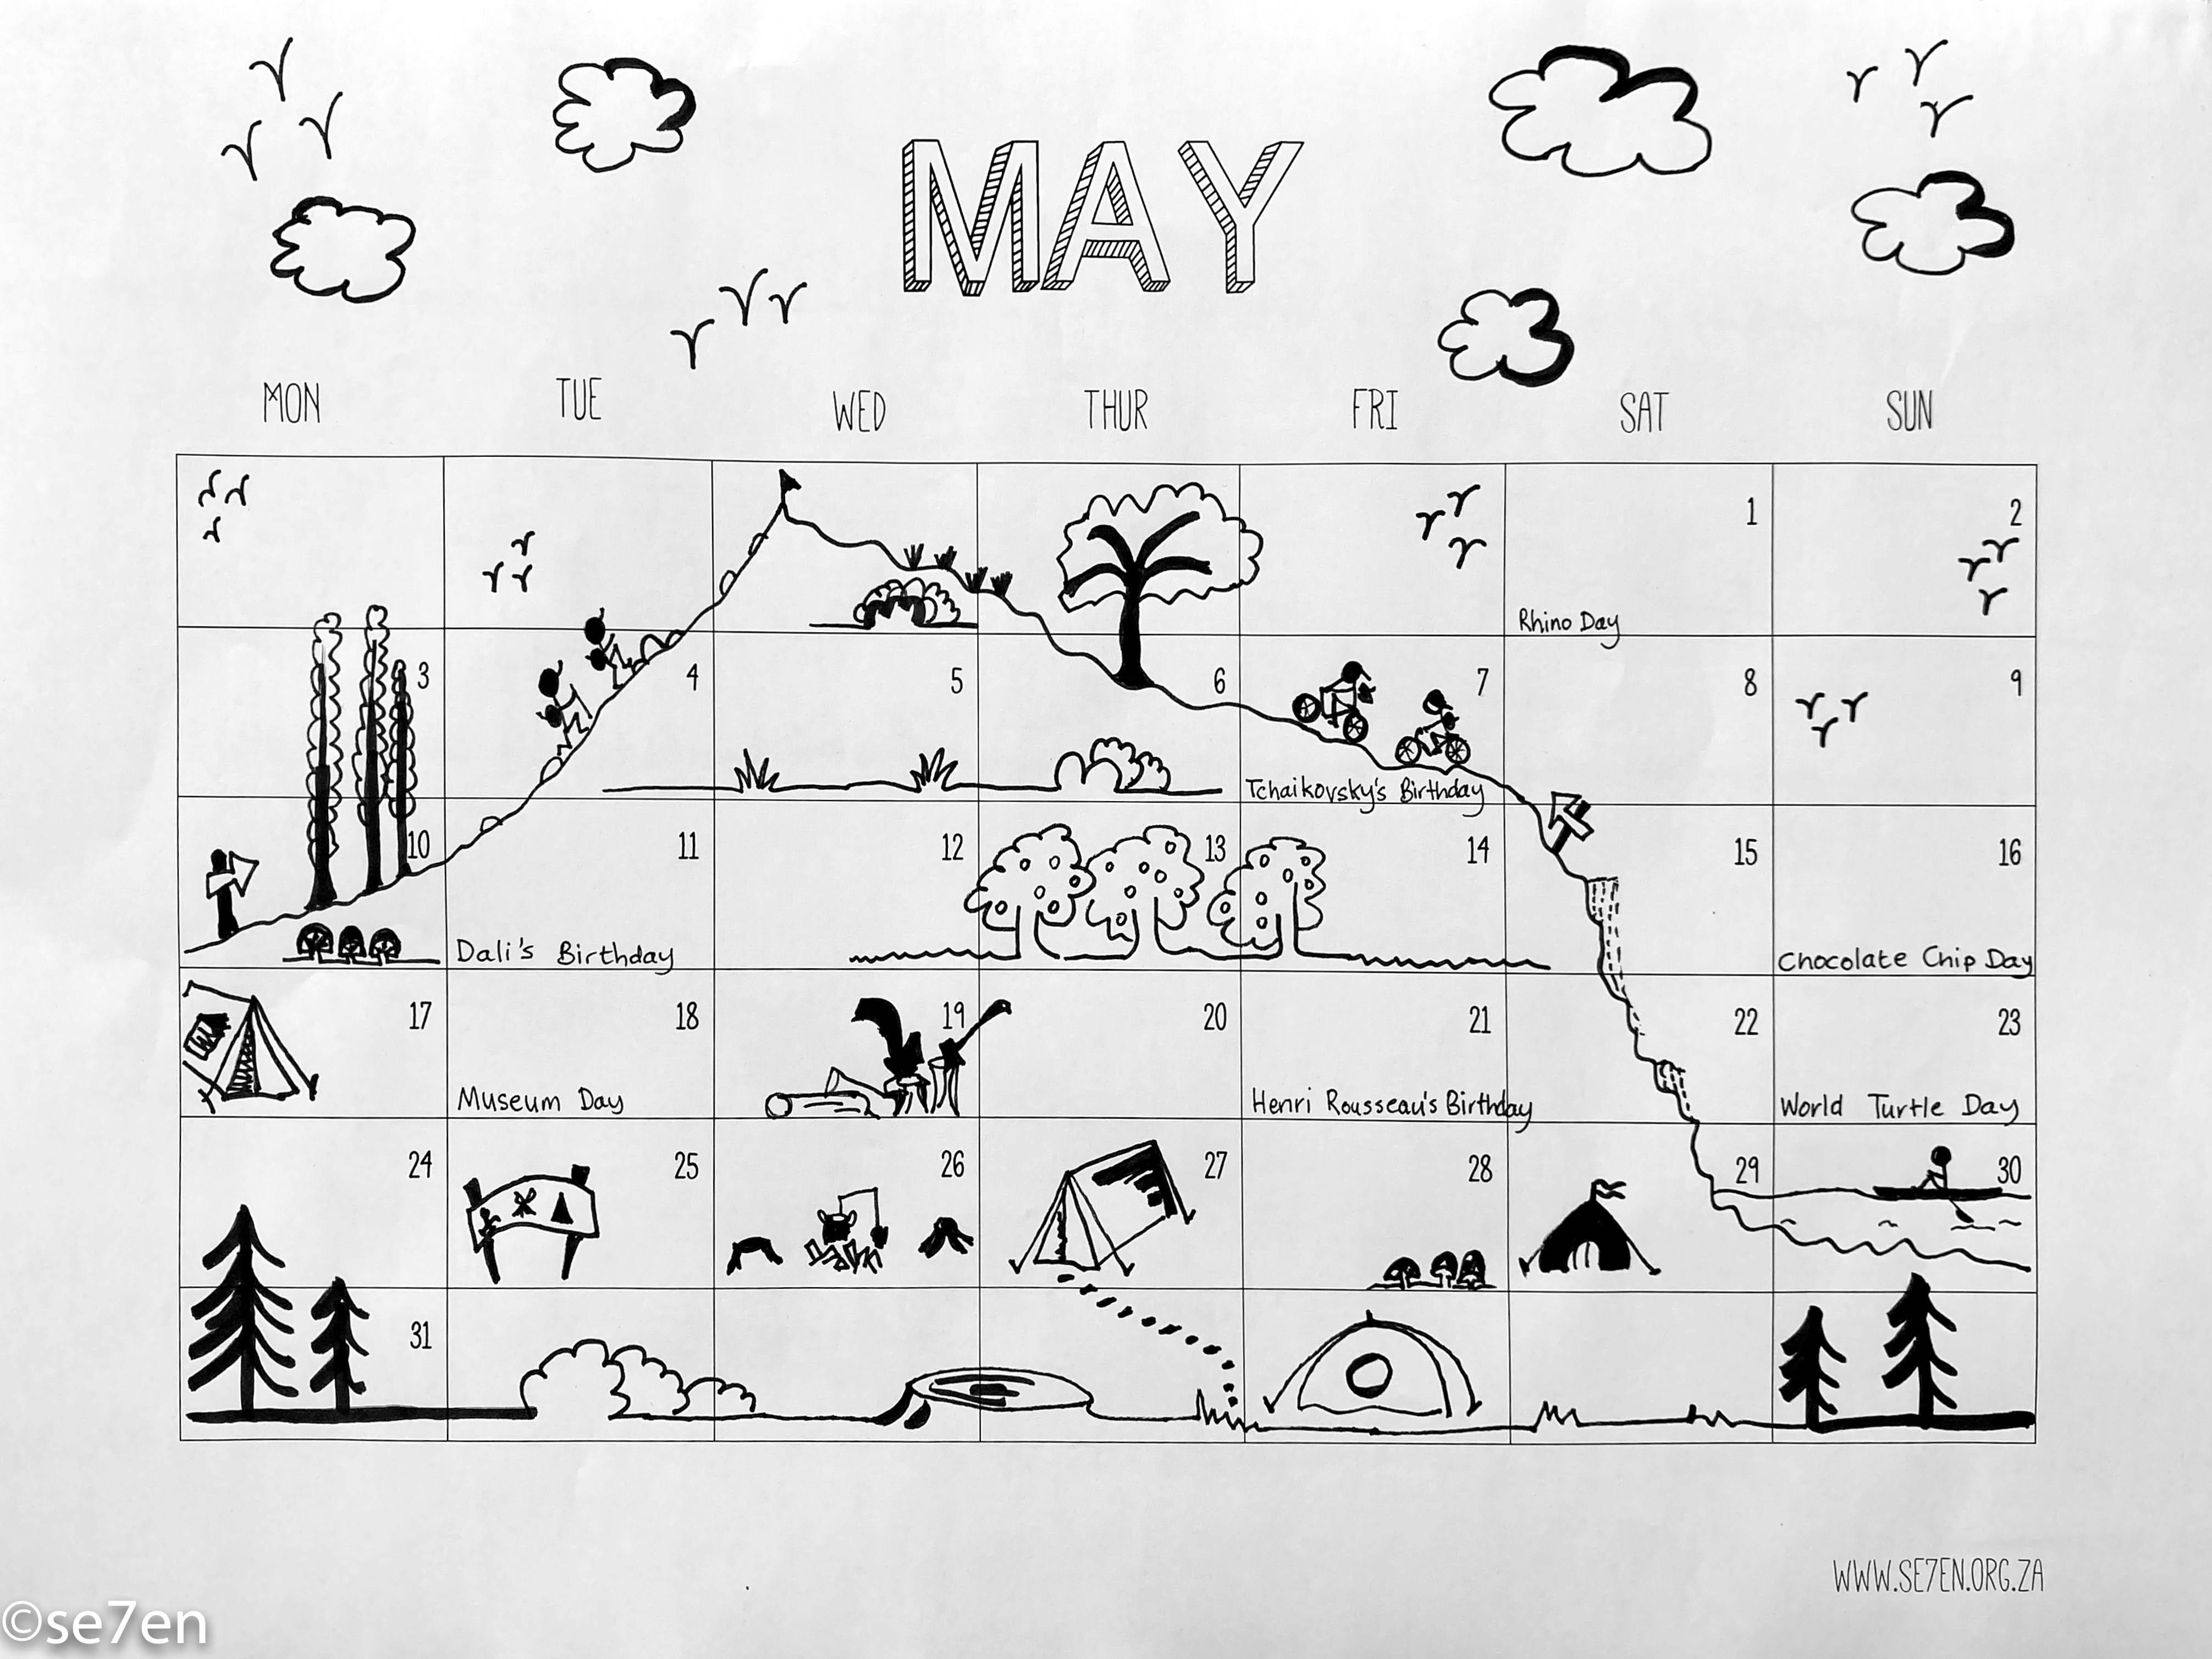 se7en-03-May-21-Whitagram-Image 2